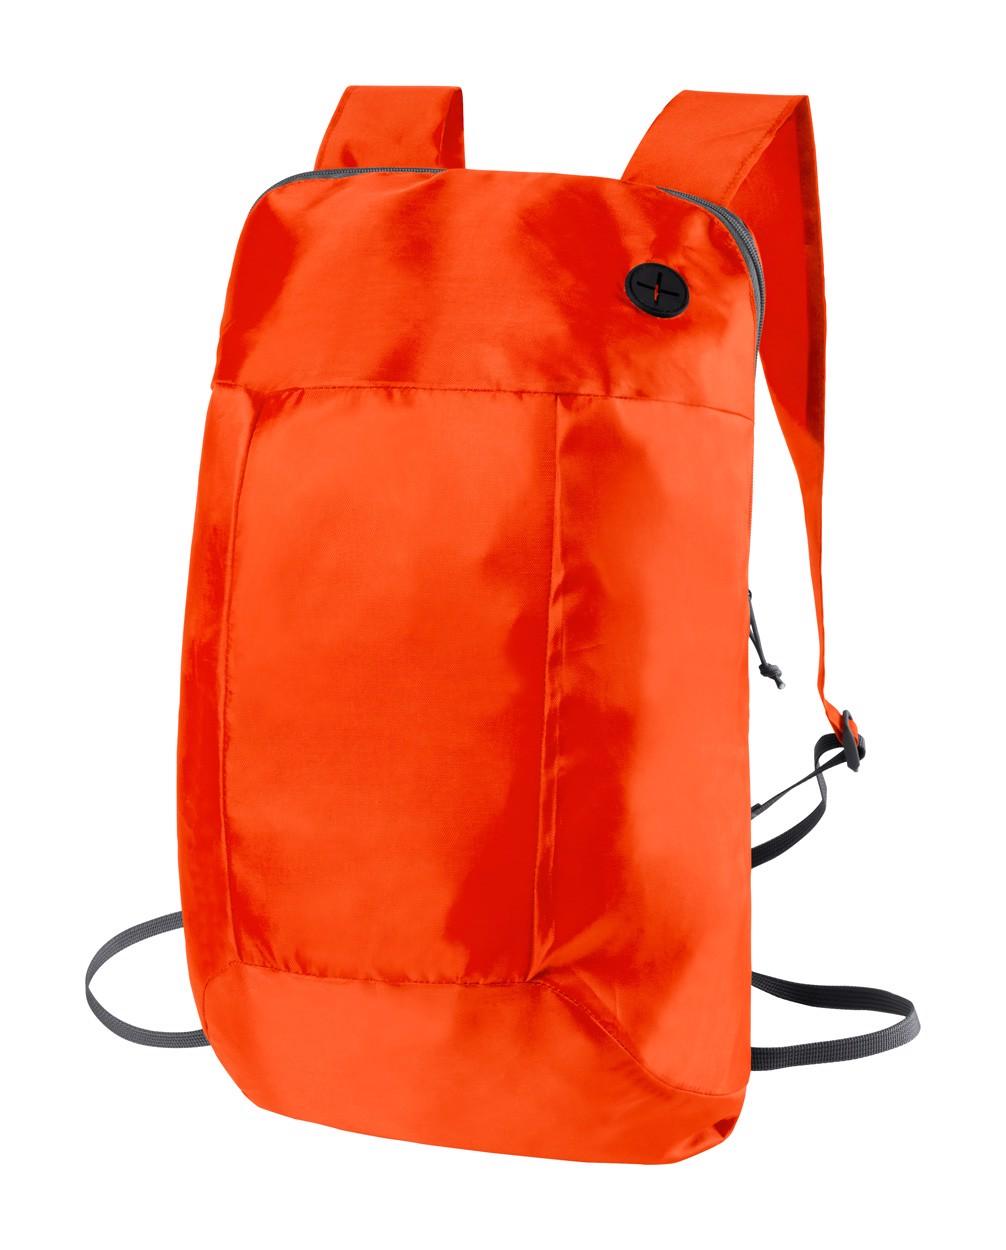 Skládací Batoh Signal - Oranžová